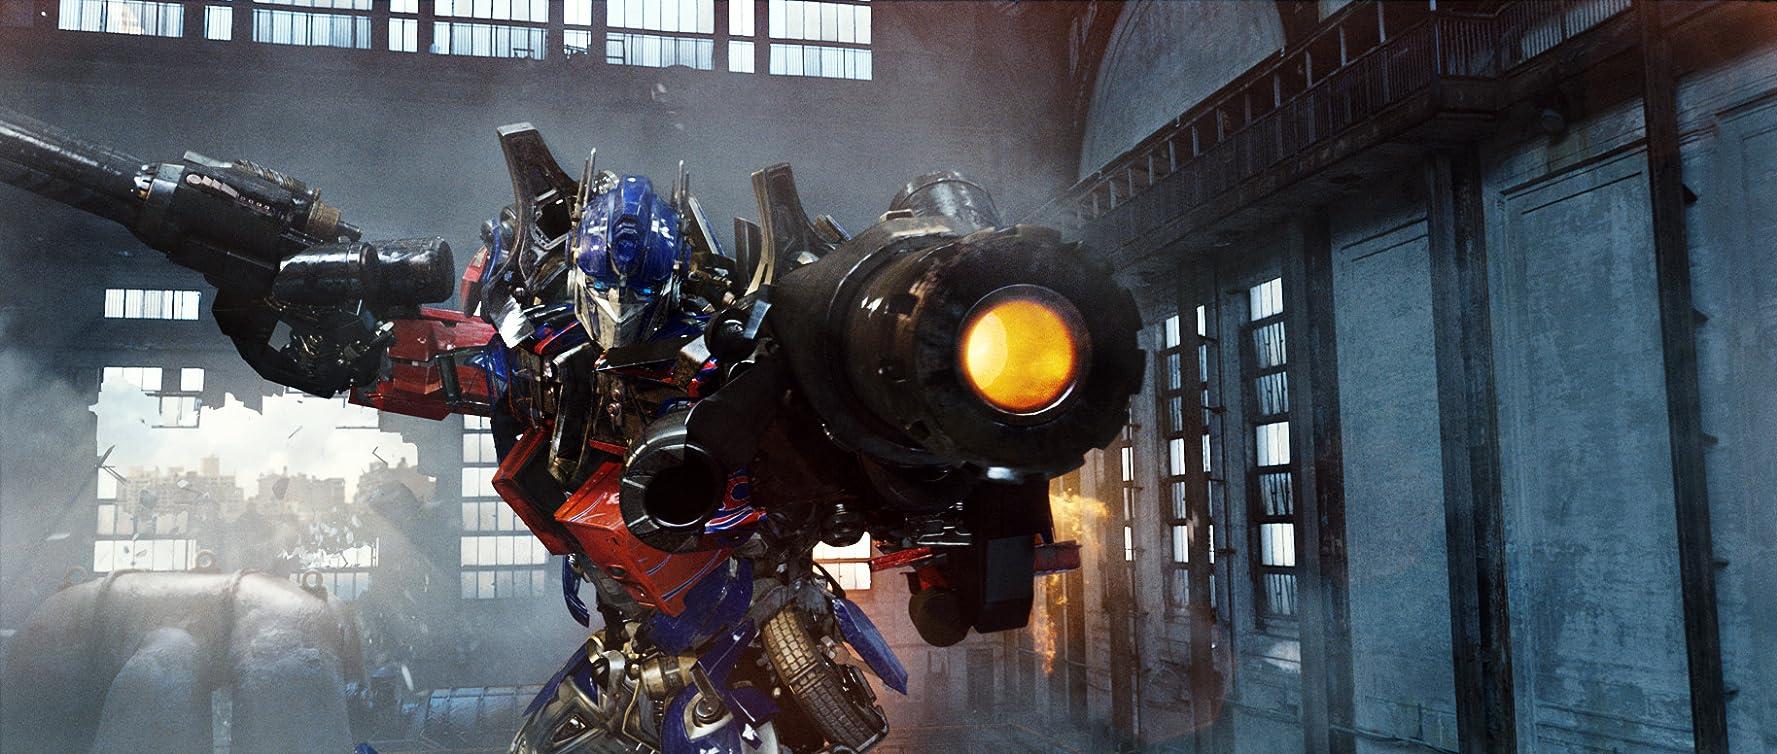 Peter Cullen in Transformers: Revenge of the Fallen (2009)